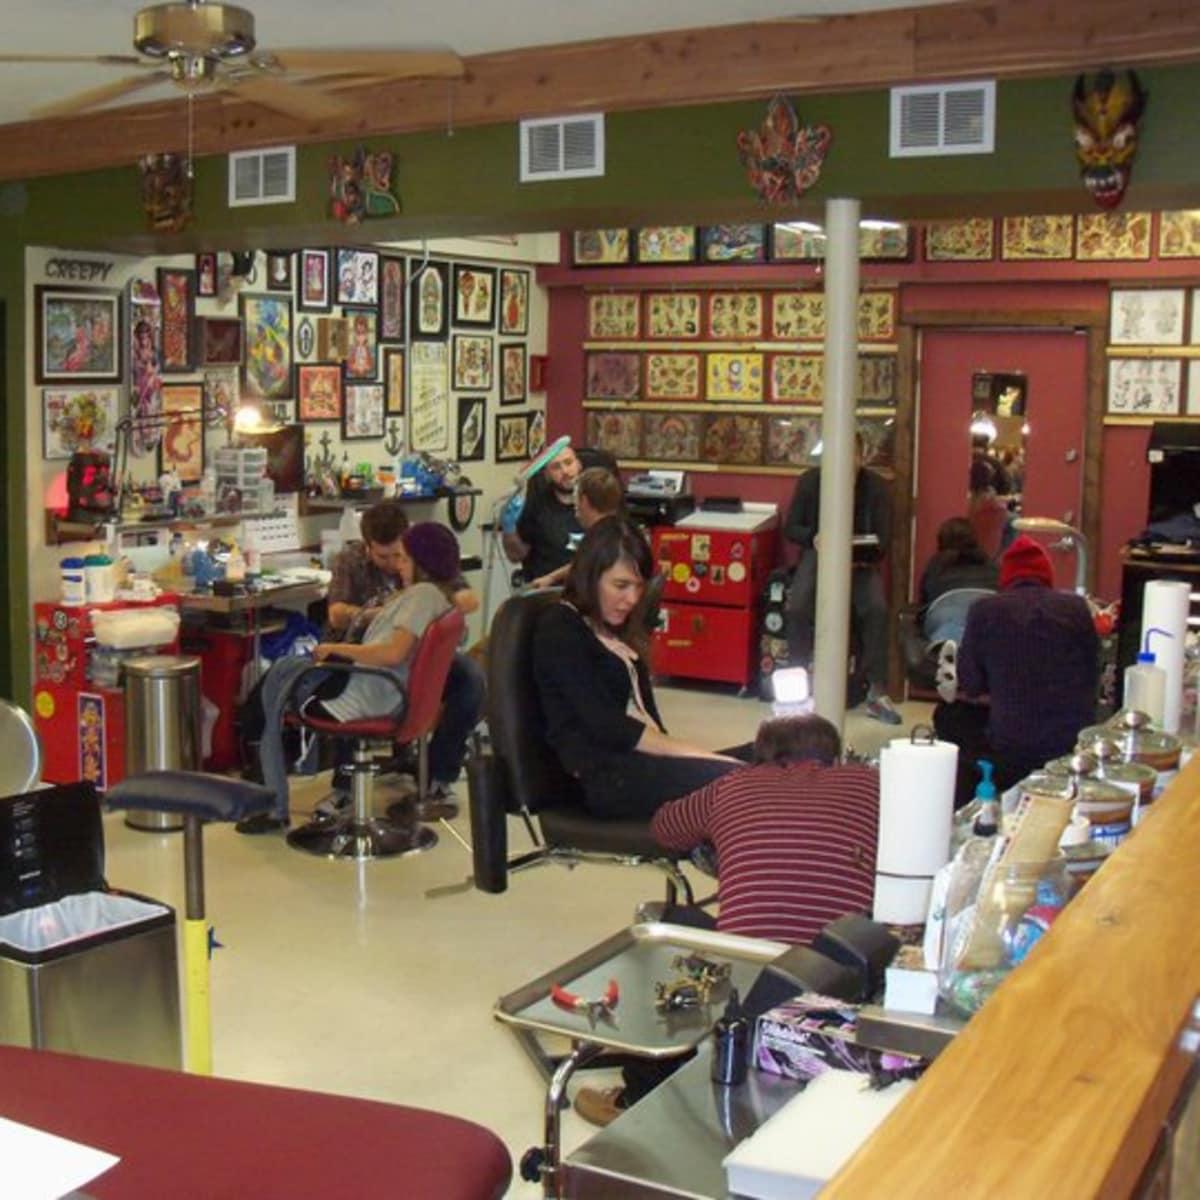 Austin_photo: places_shopping_amillion tattoo_interior